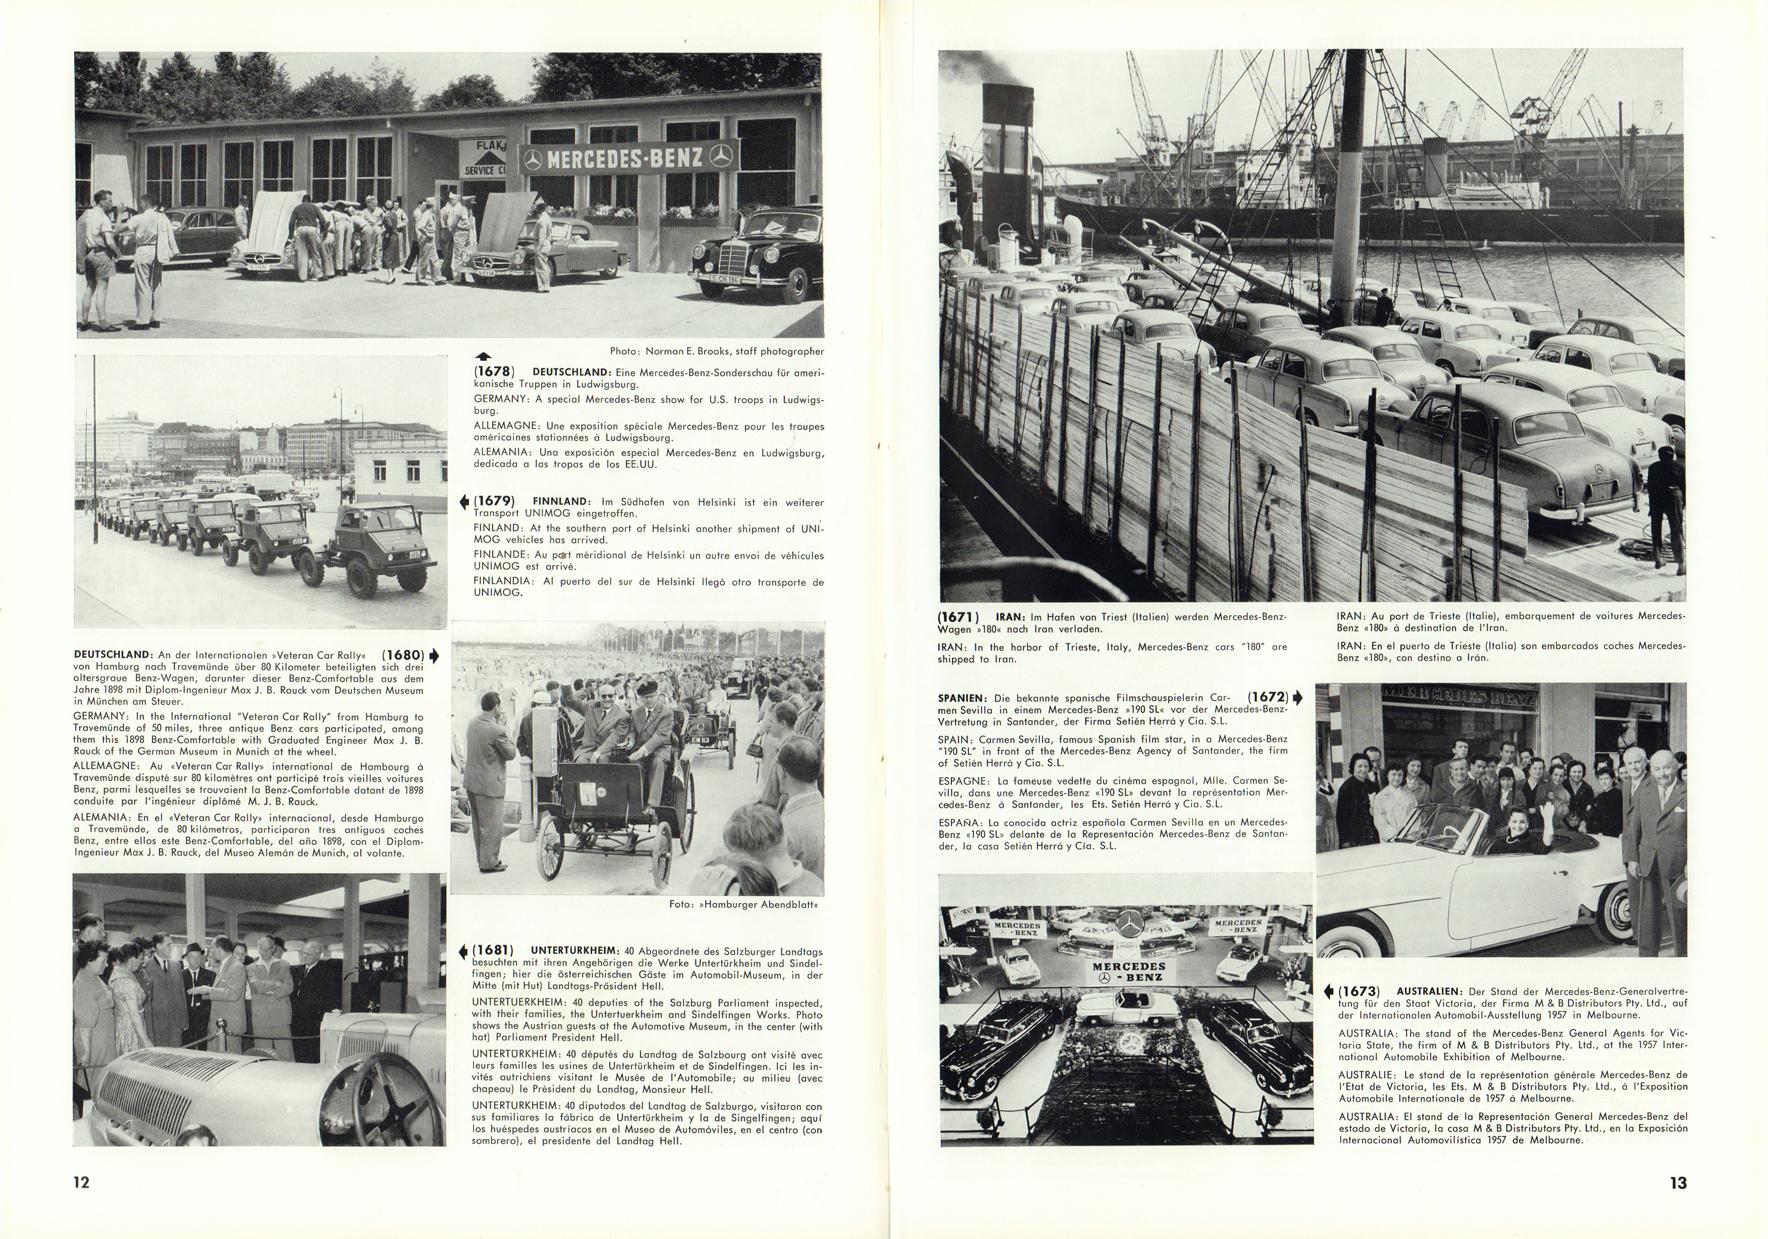 (REVISTA): Periódico In aller welt n.º 12 - Mercedes-Benz no mundo - 1957 - multilingue 007